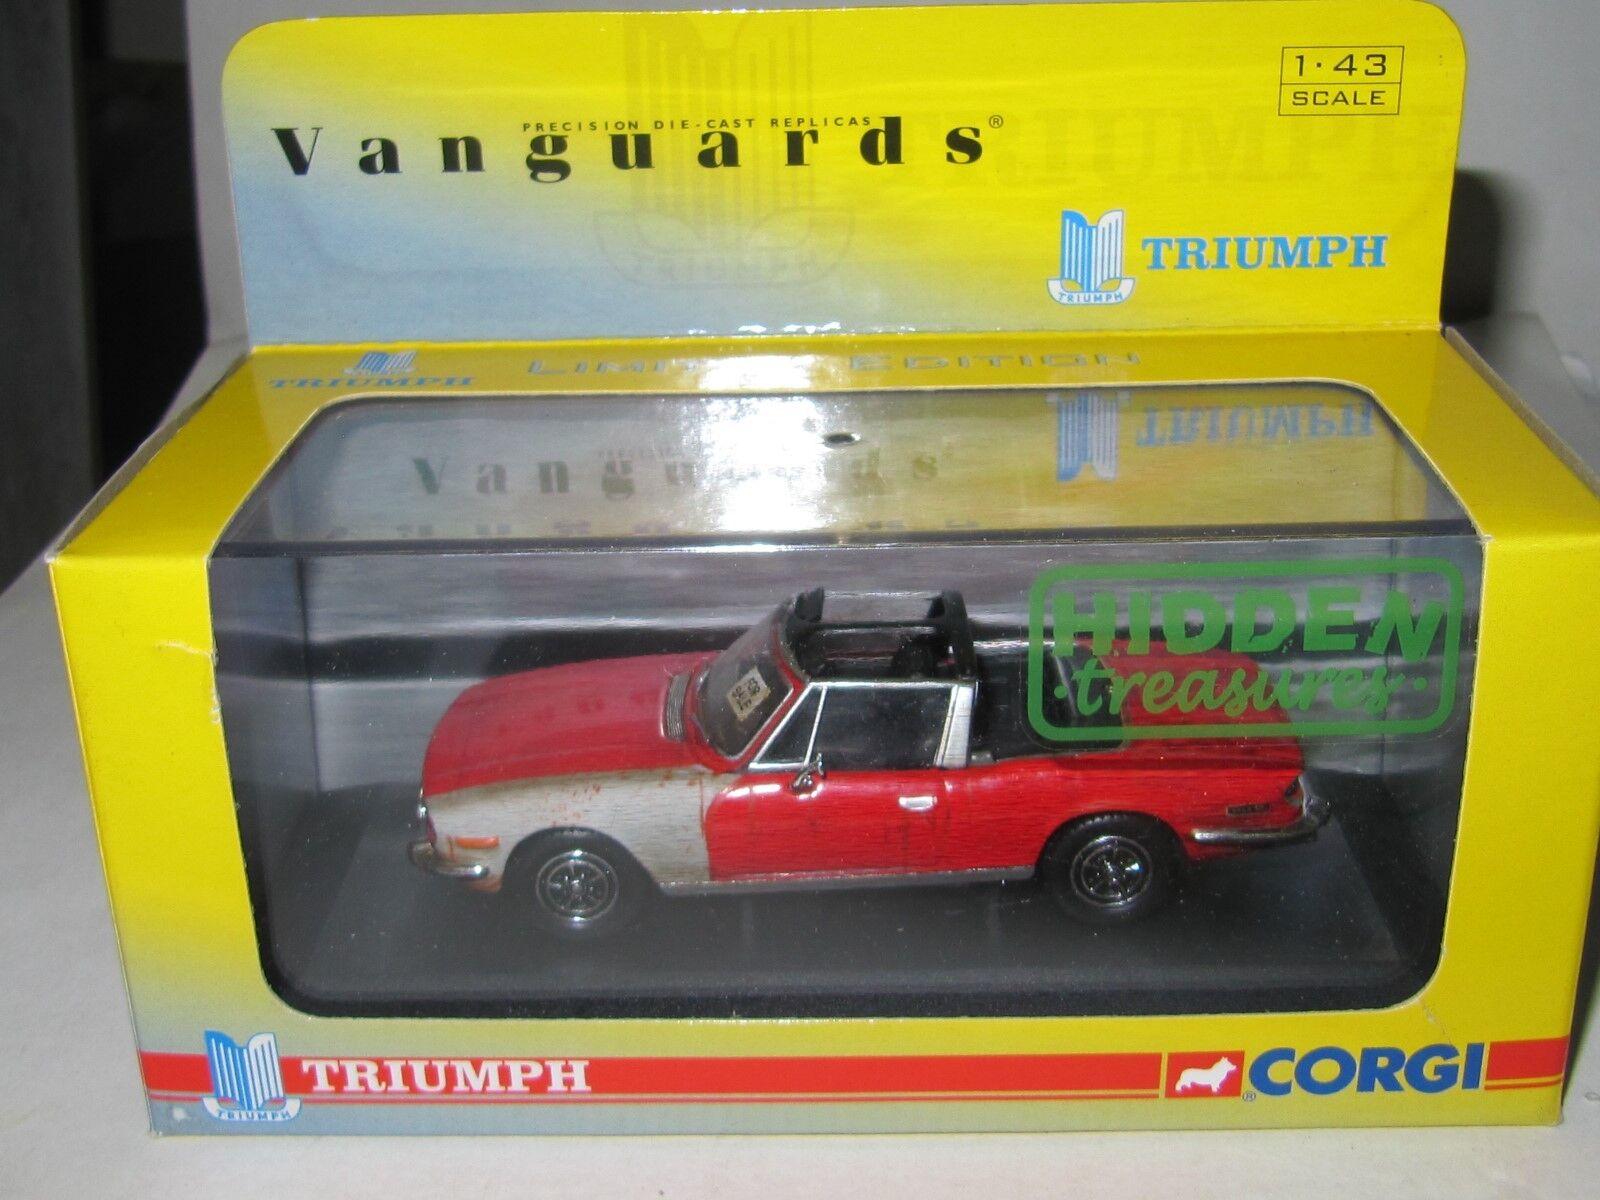 Corgi Vanguards - TRIUMPH STAG - PIMENTO RED VA10101 Mint Boxed